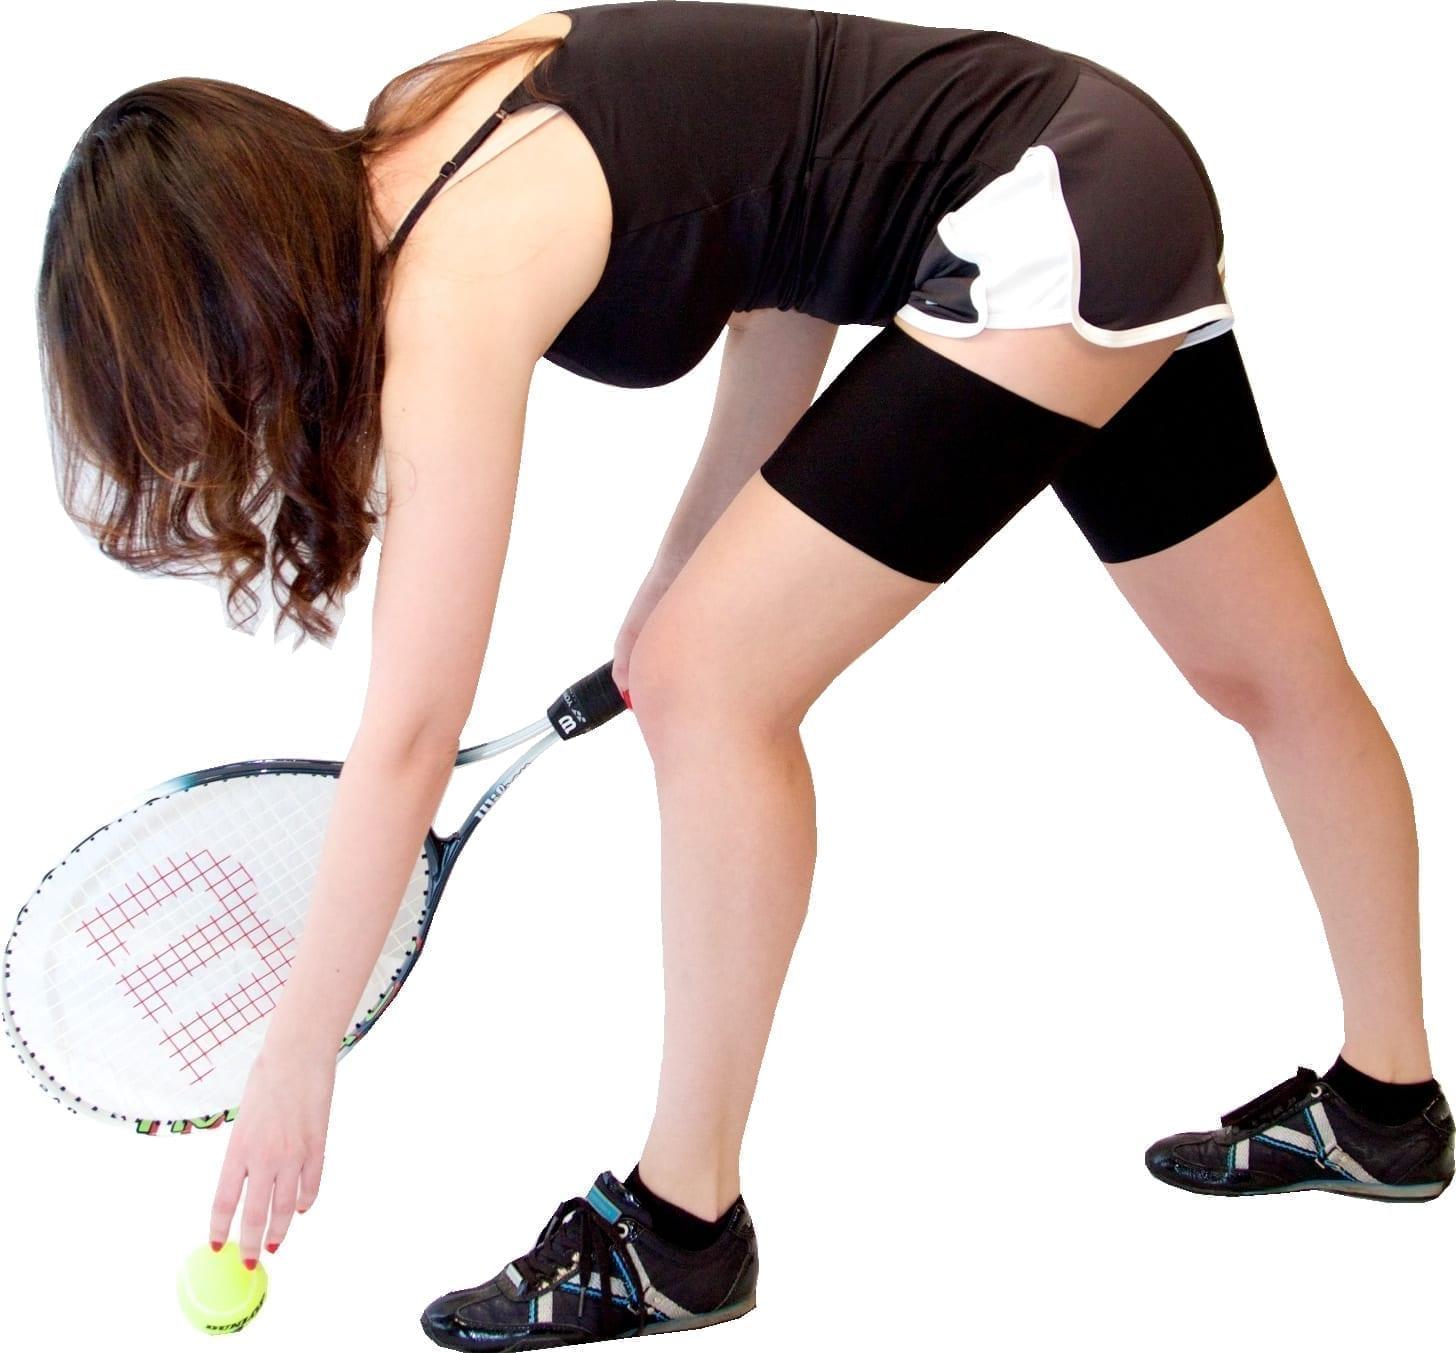 Bandelettes Unisex sporty women